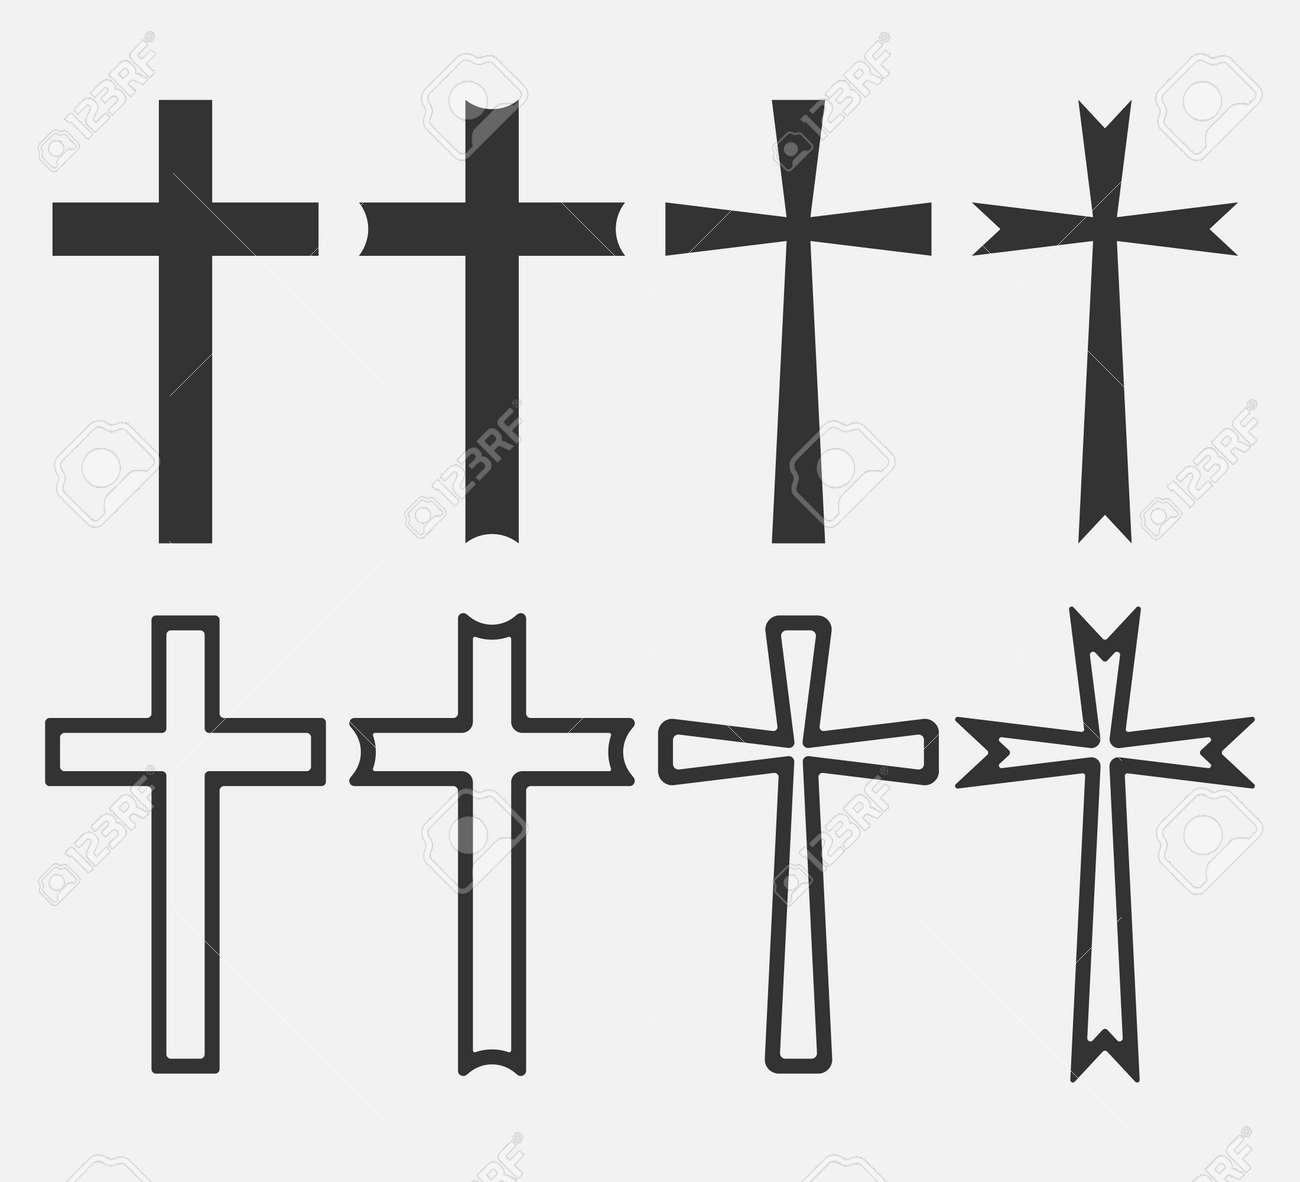 Set of Christian Cross icon app, UI. Vector illustration. - 164871899